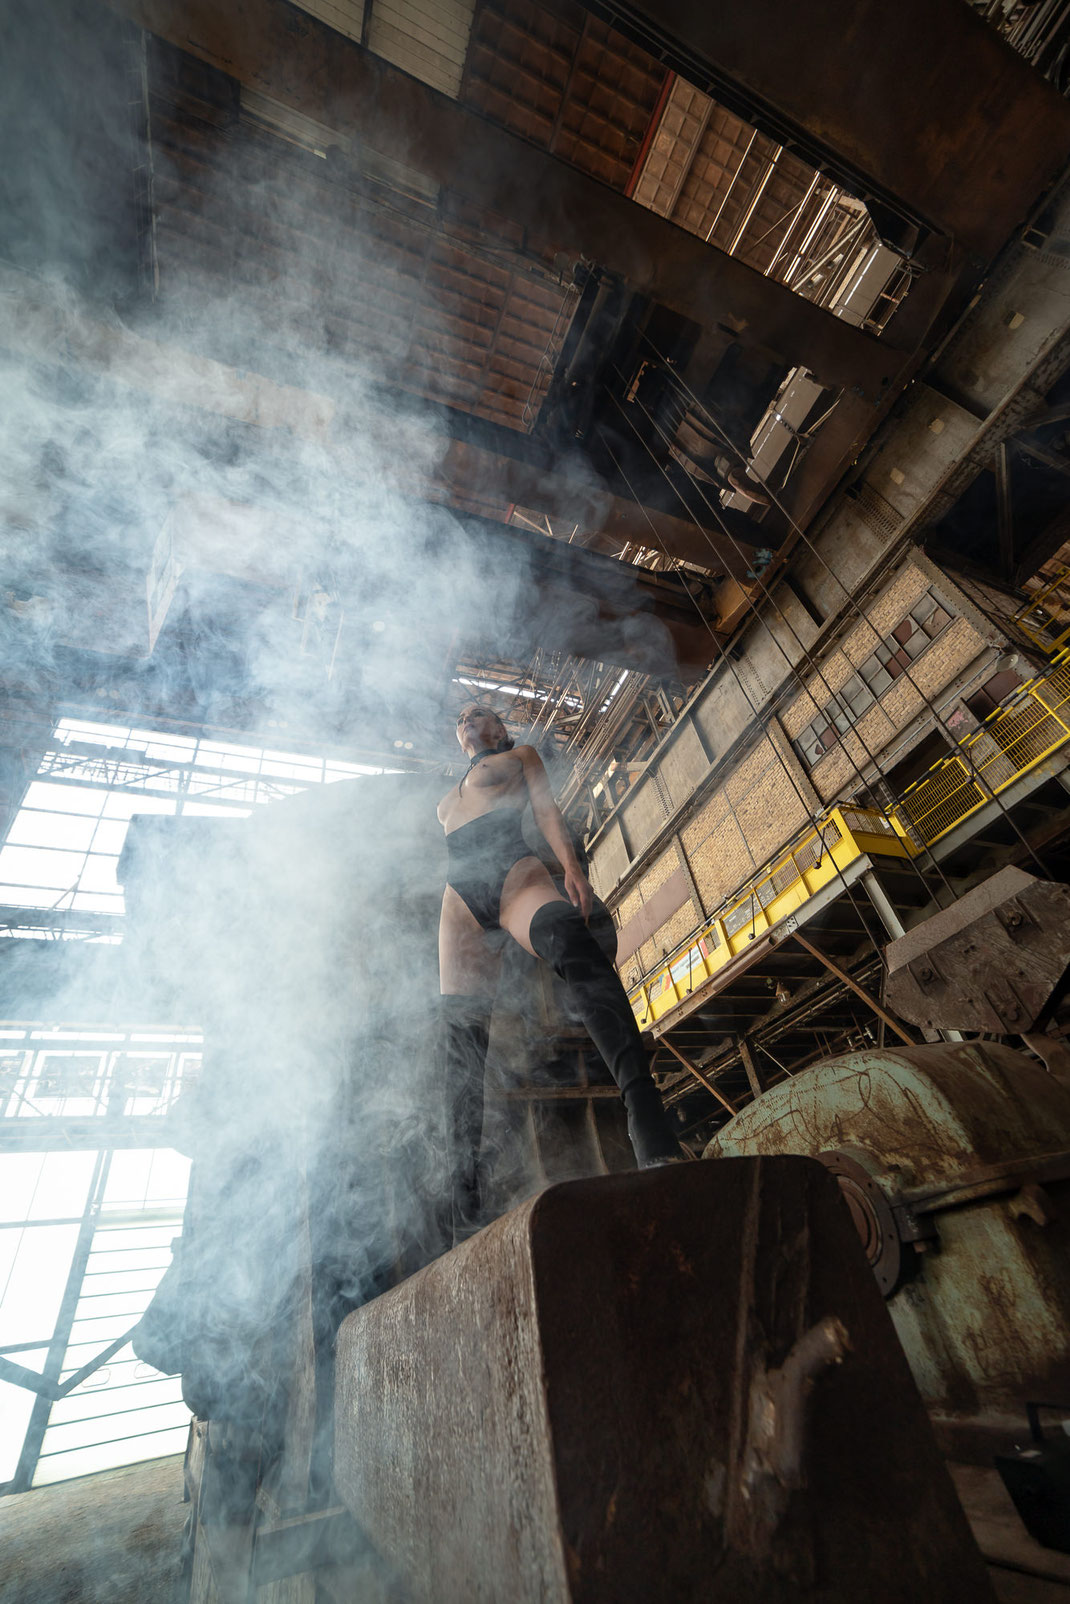 Steelworks Fashion - Angélique - Markus Hertzsch - Art - Model - Steel - Rust - Body - Iron - Portrait - Fashion - Grading - Look - Legs - Boots